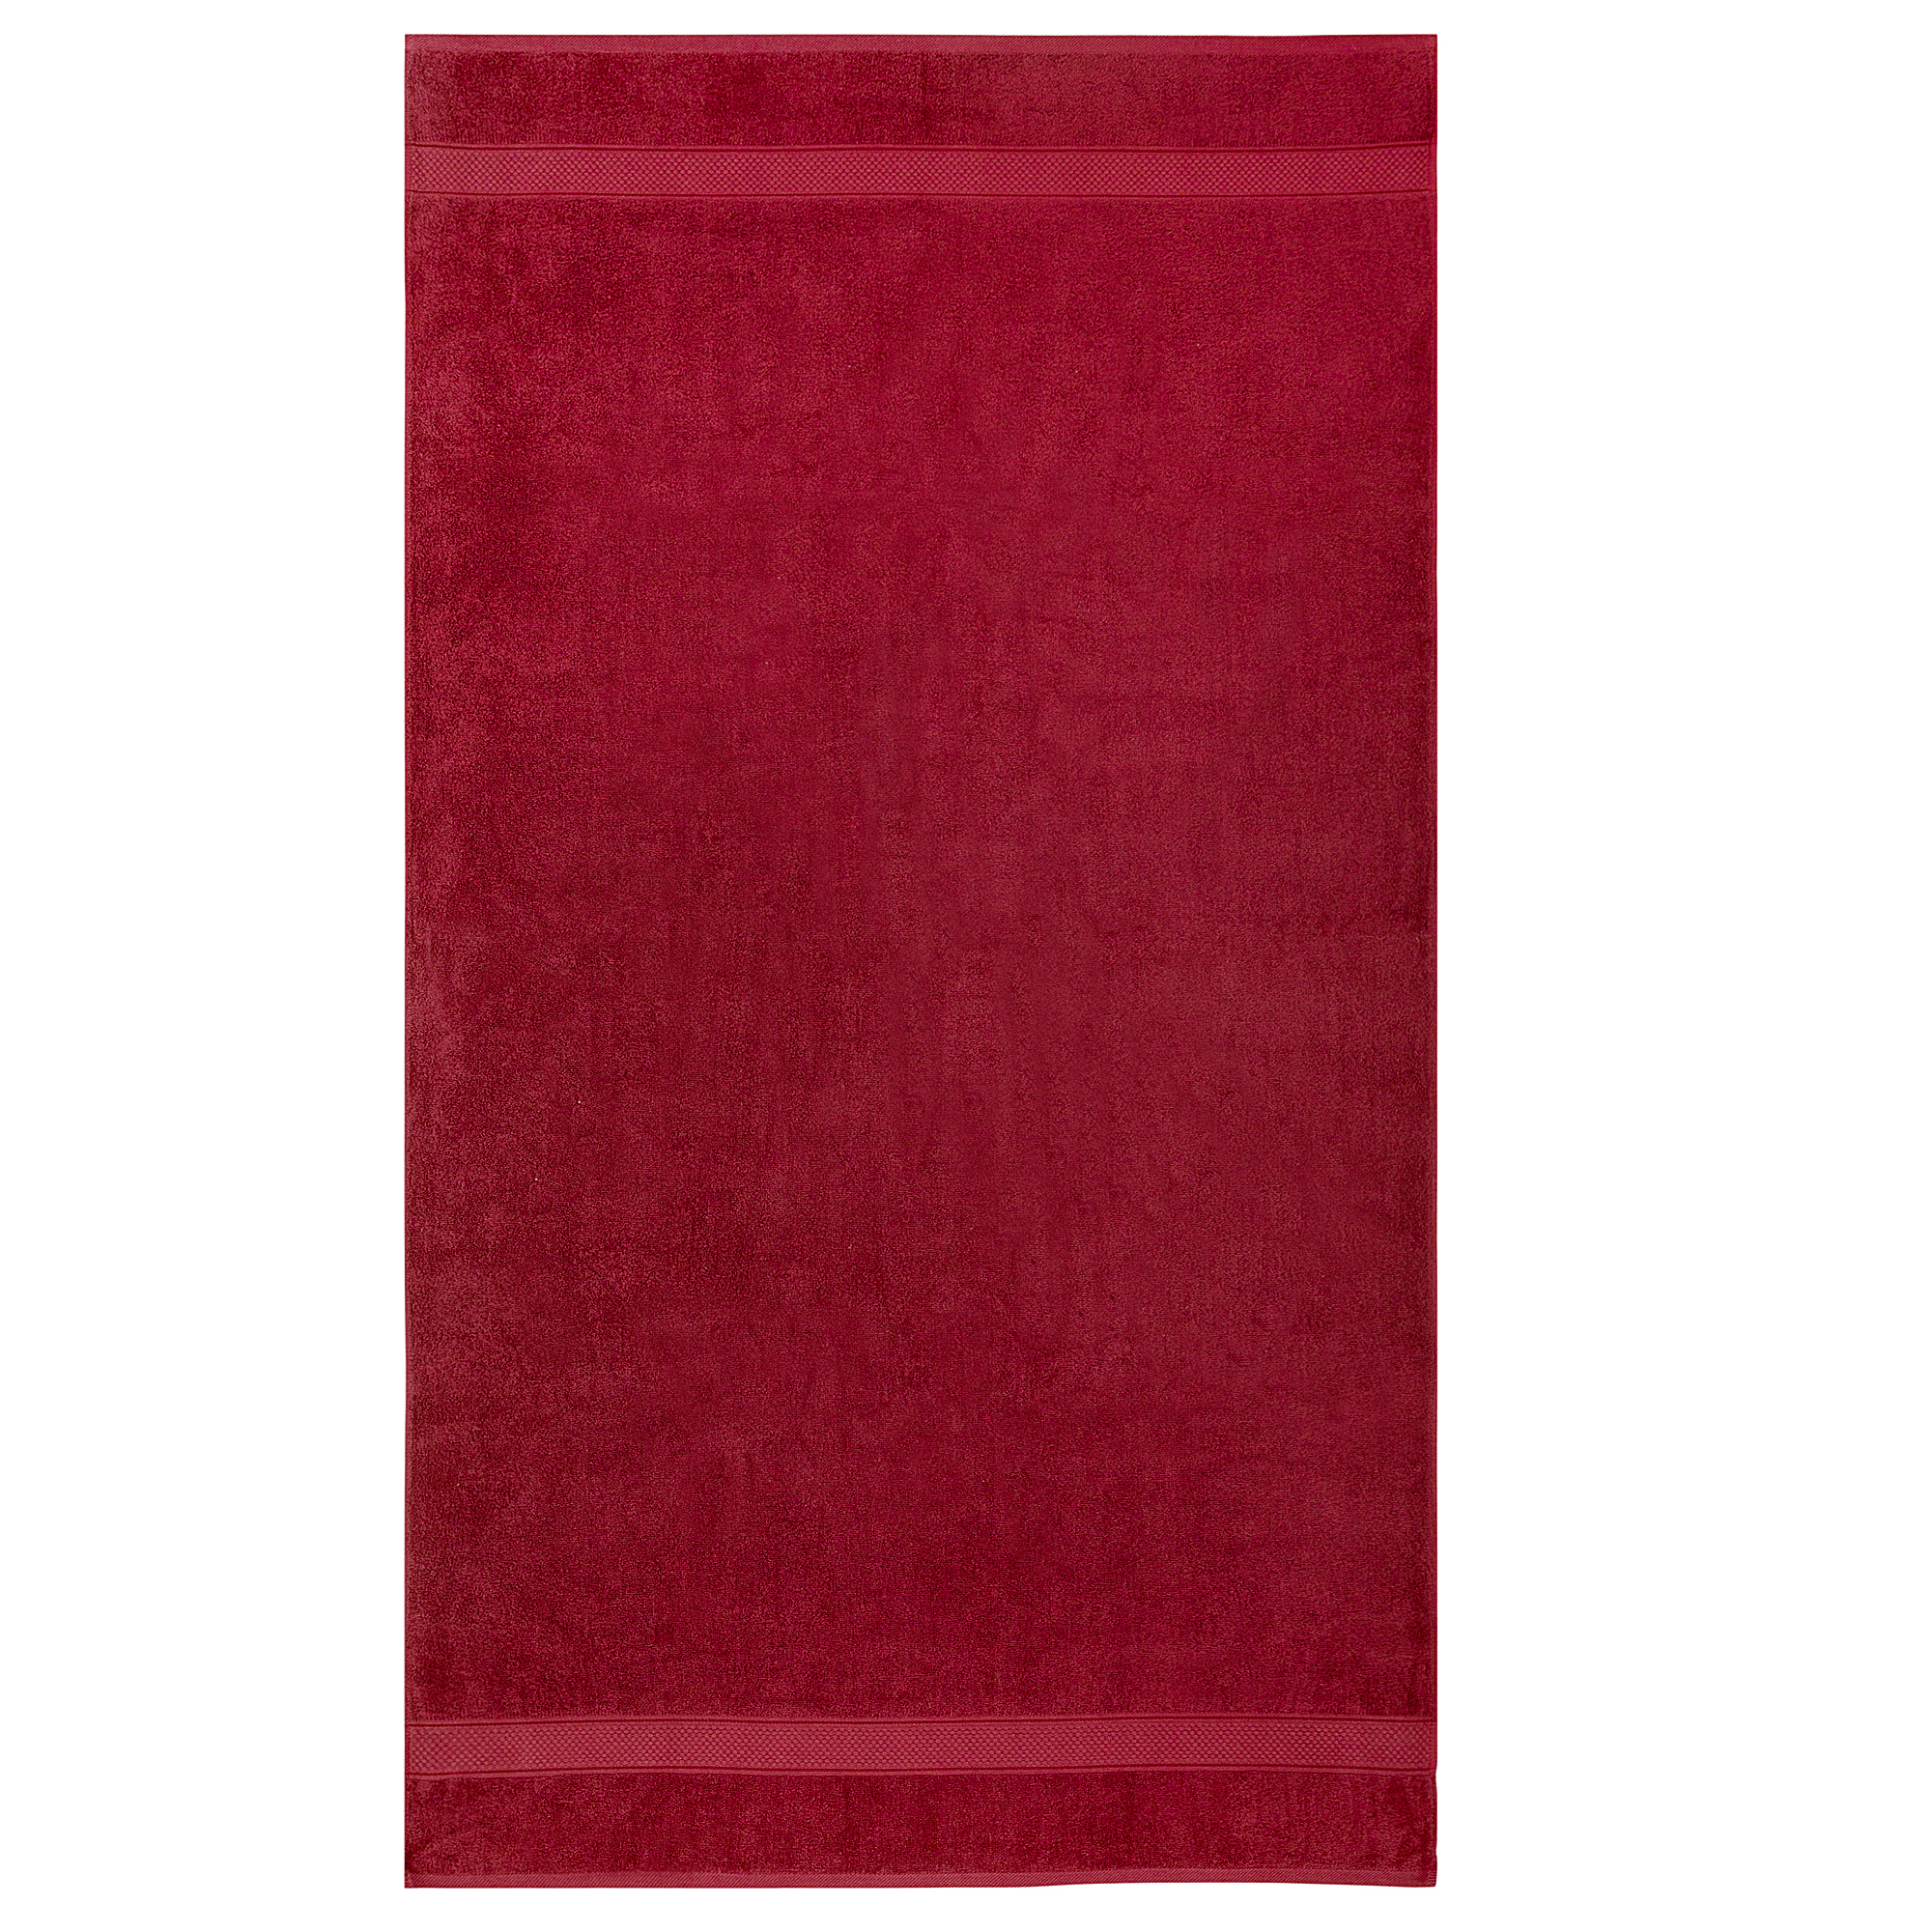 Bale Set 2pcs Burgundy Premium Plain Extra Large Bath Sheet Towel